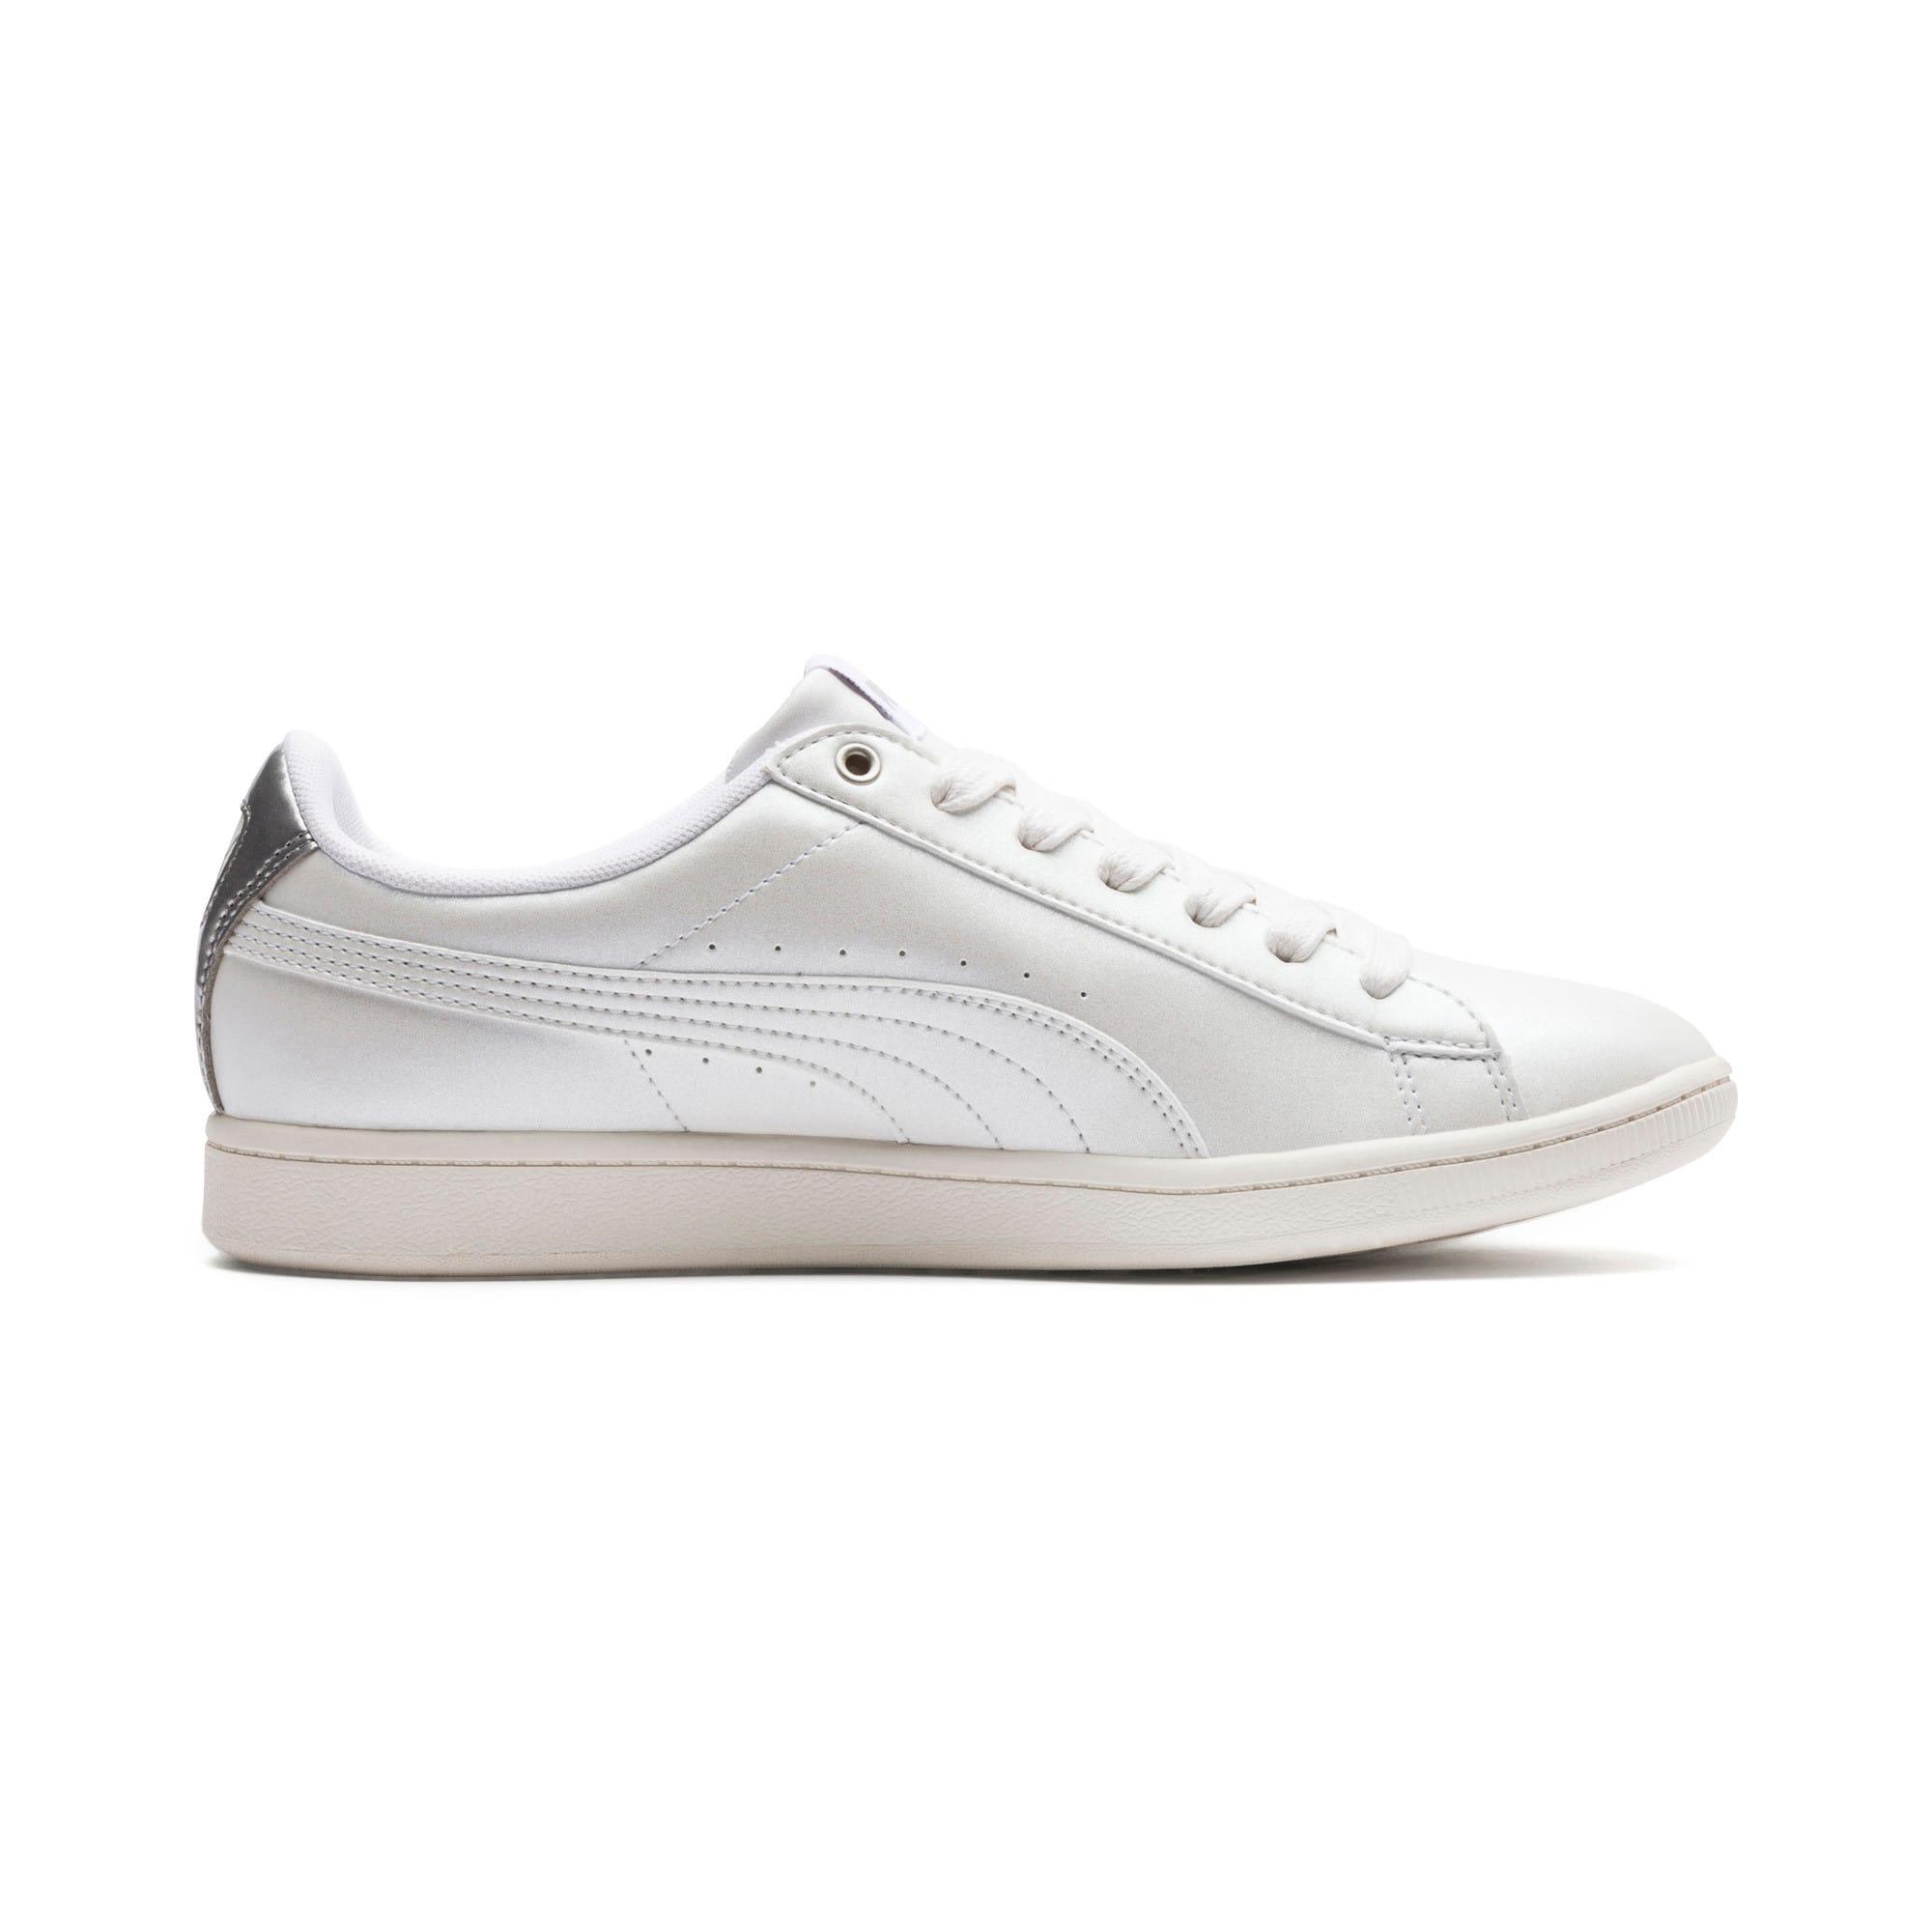 Thumbnail 5 of Puma Vikky LX Sneakers, Puma White-White-Whisper, medium